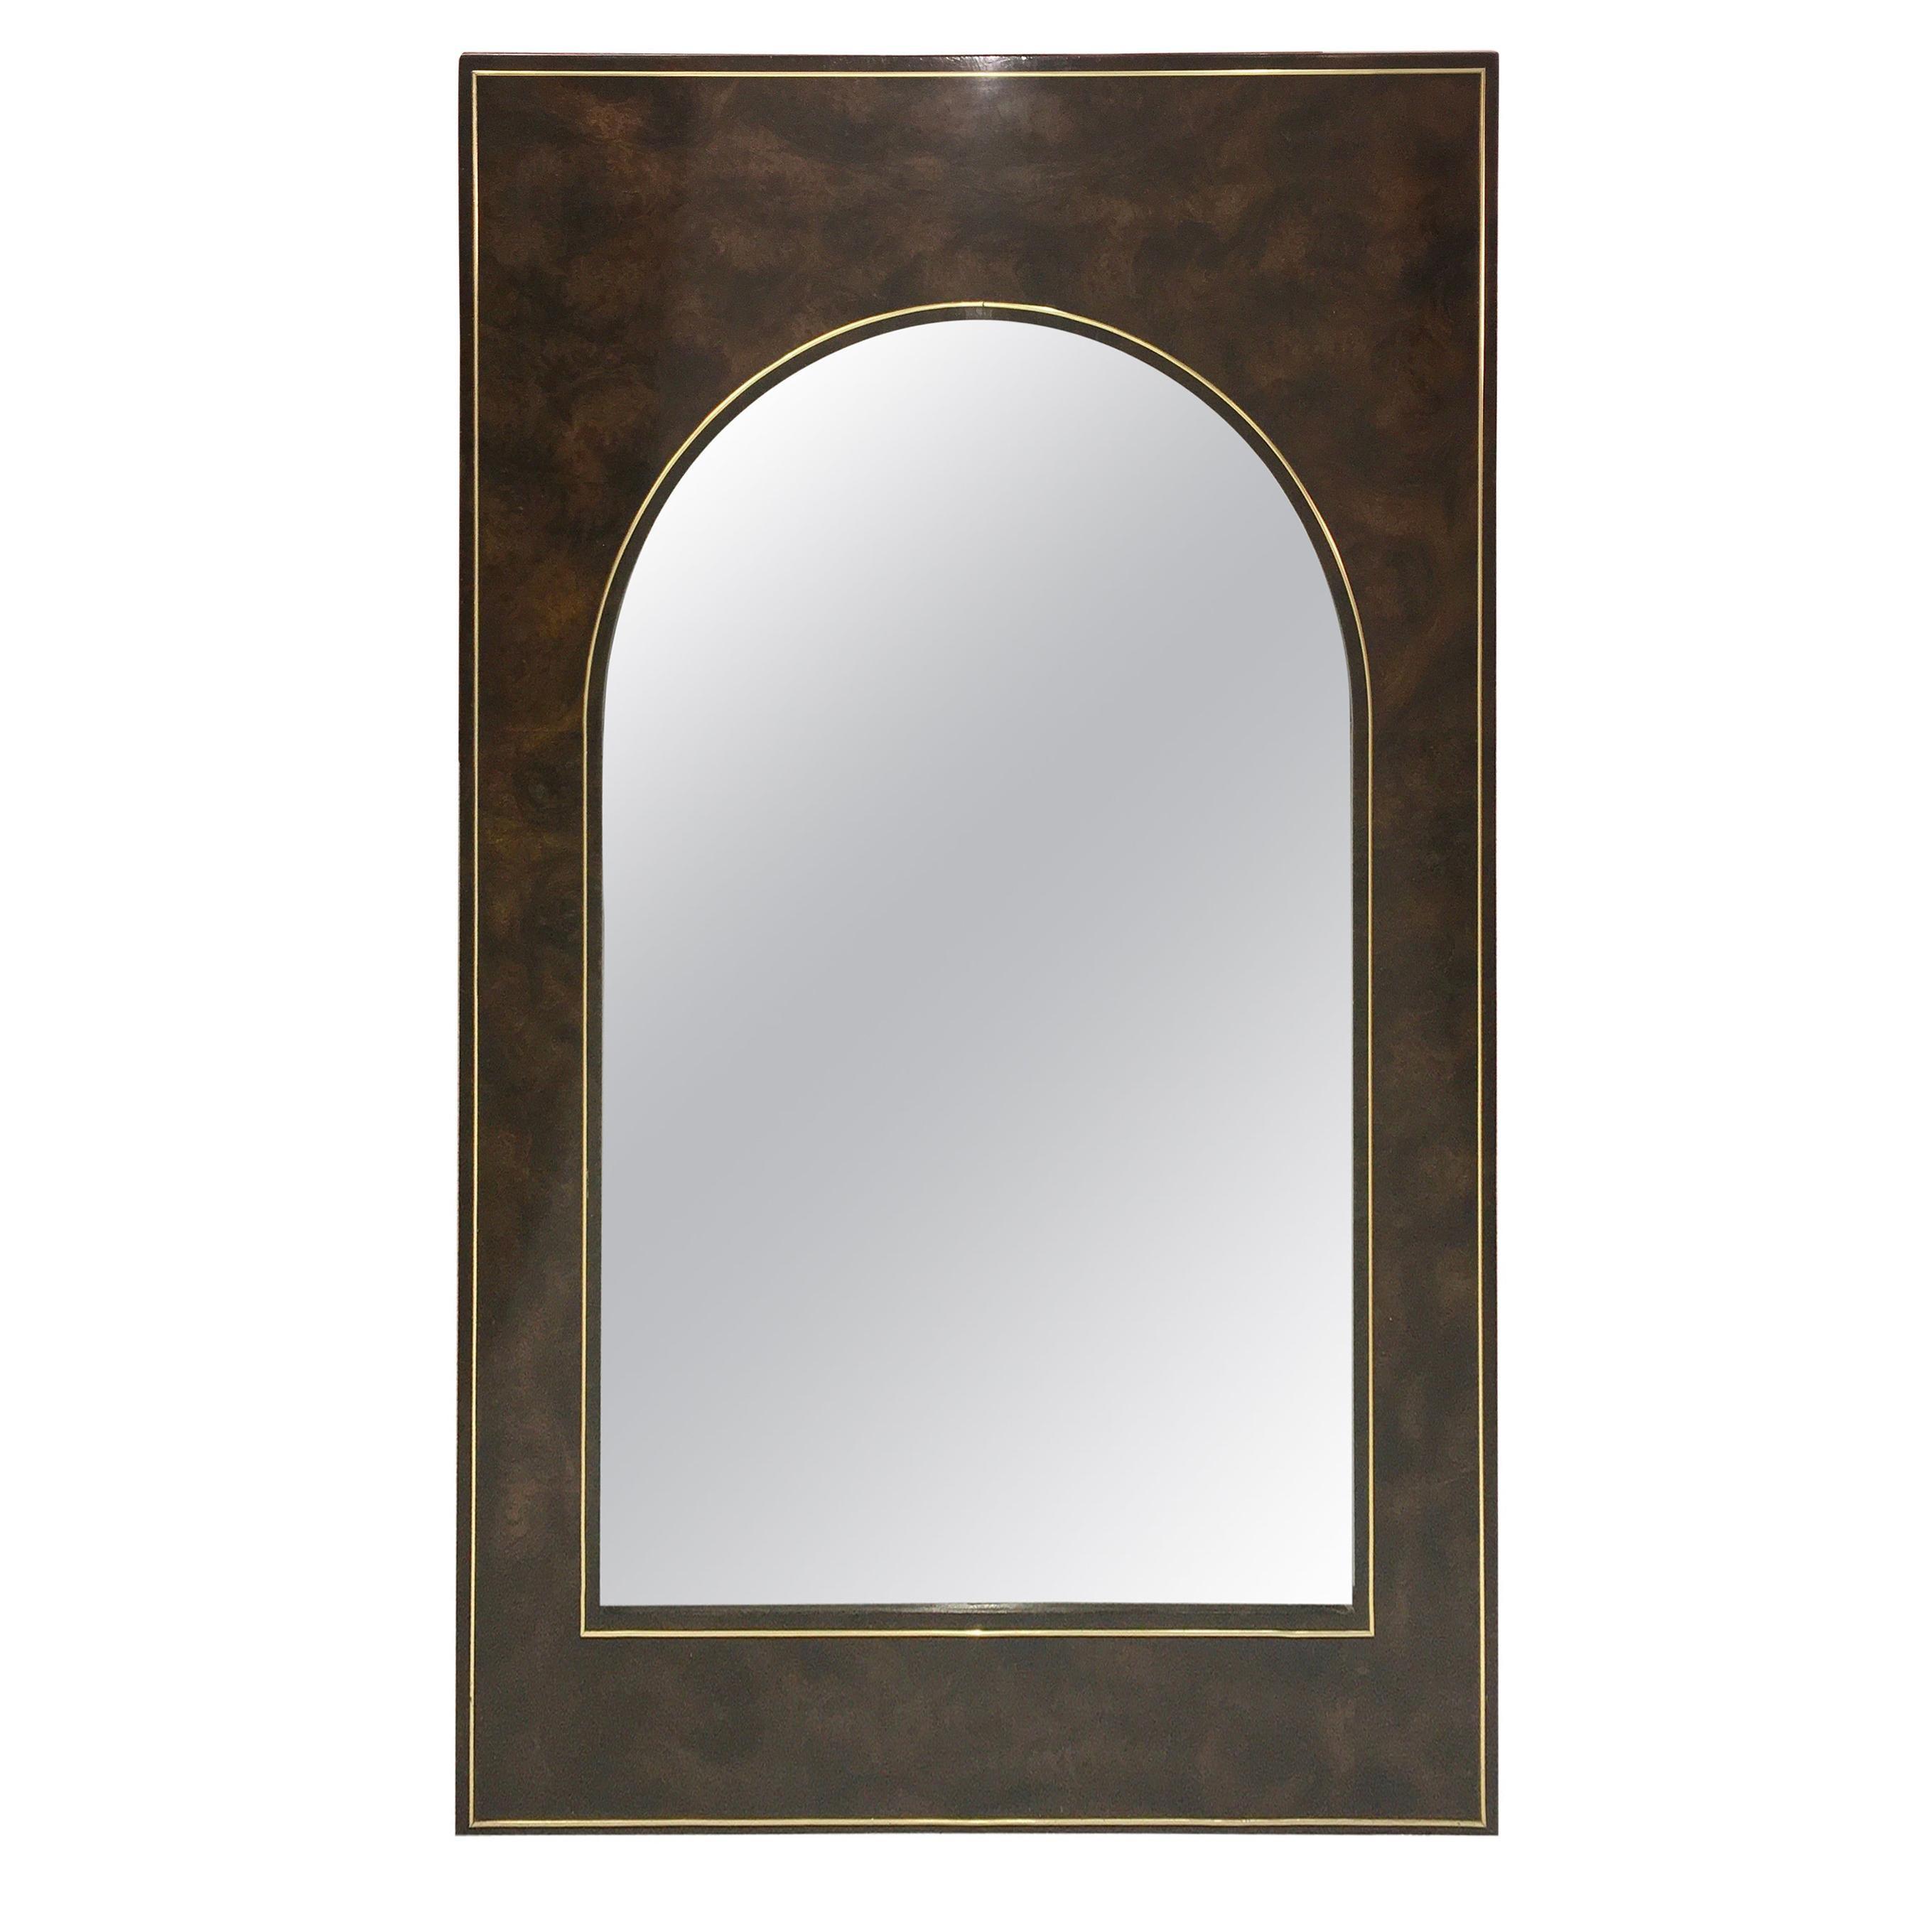 Futurist Arch Form Mirror in Carpathian Elm and Brass by Mastercraft